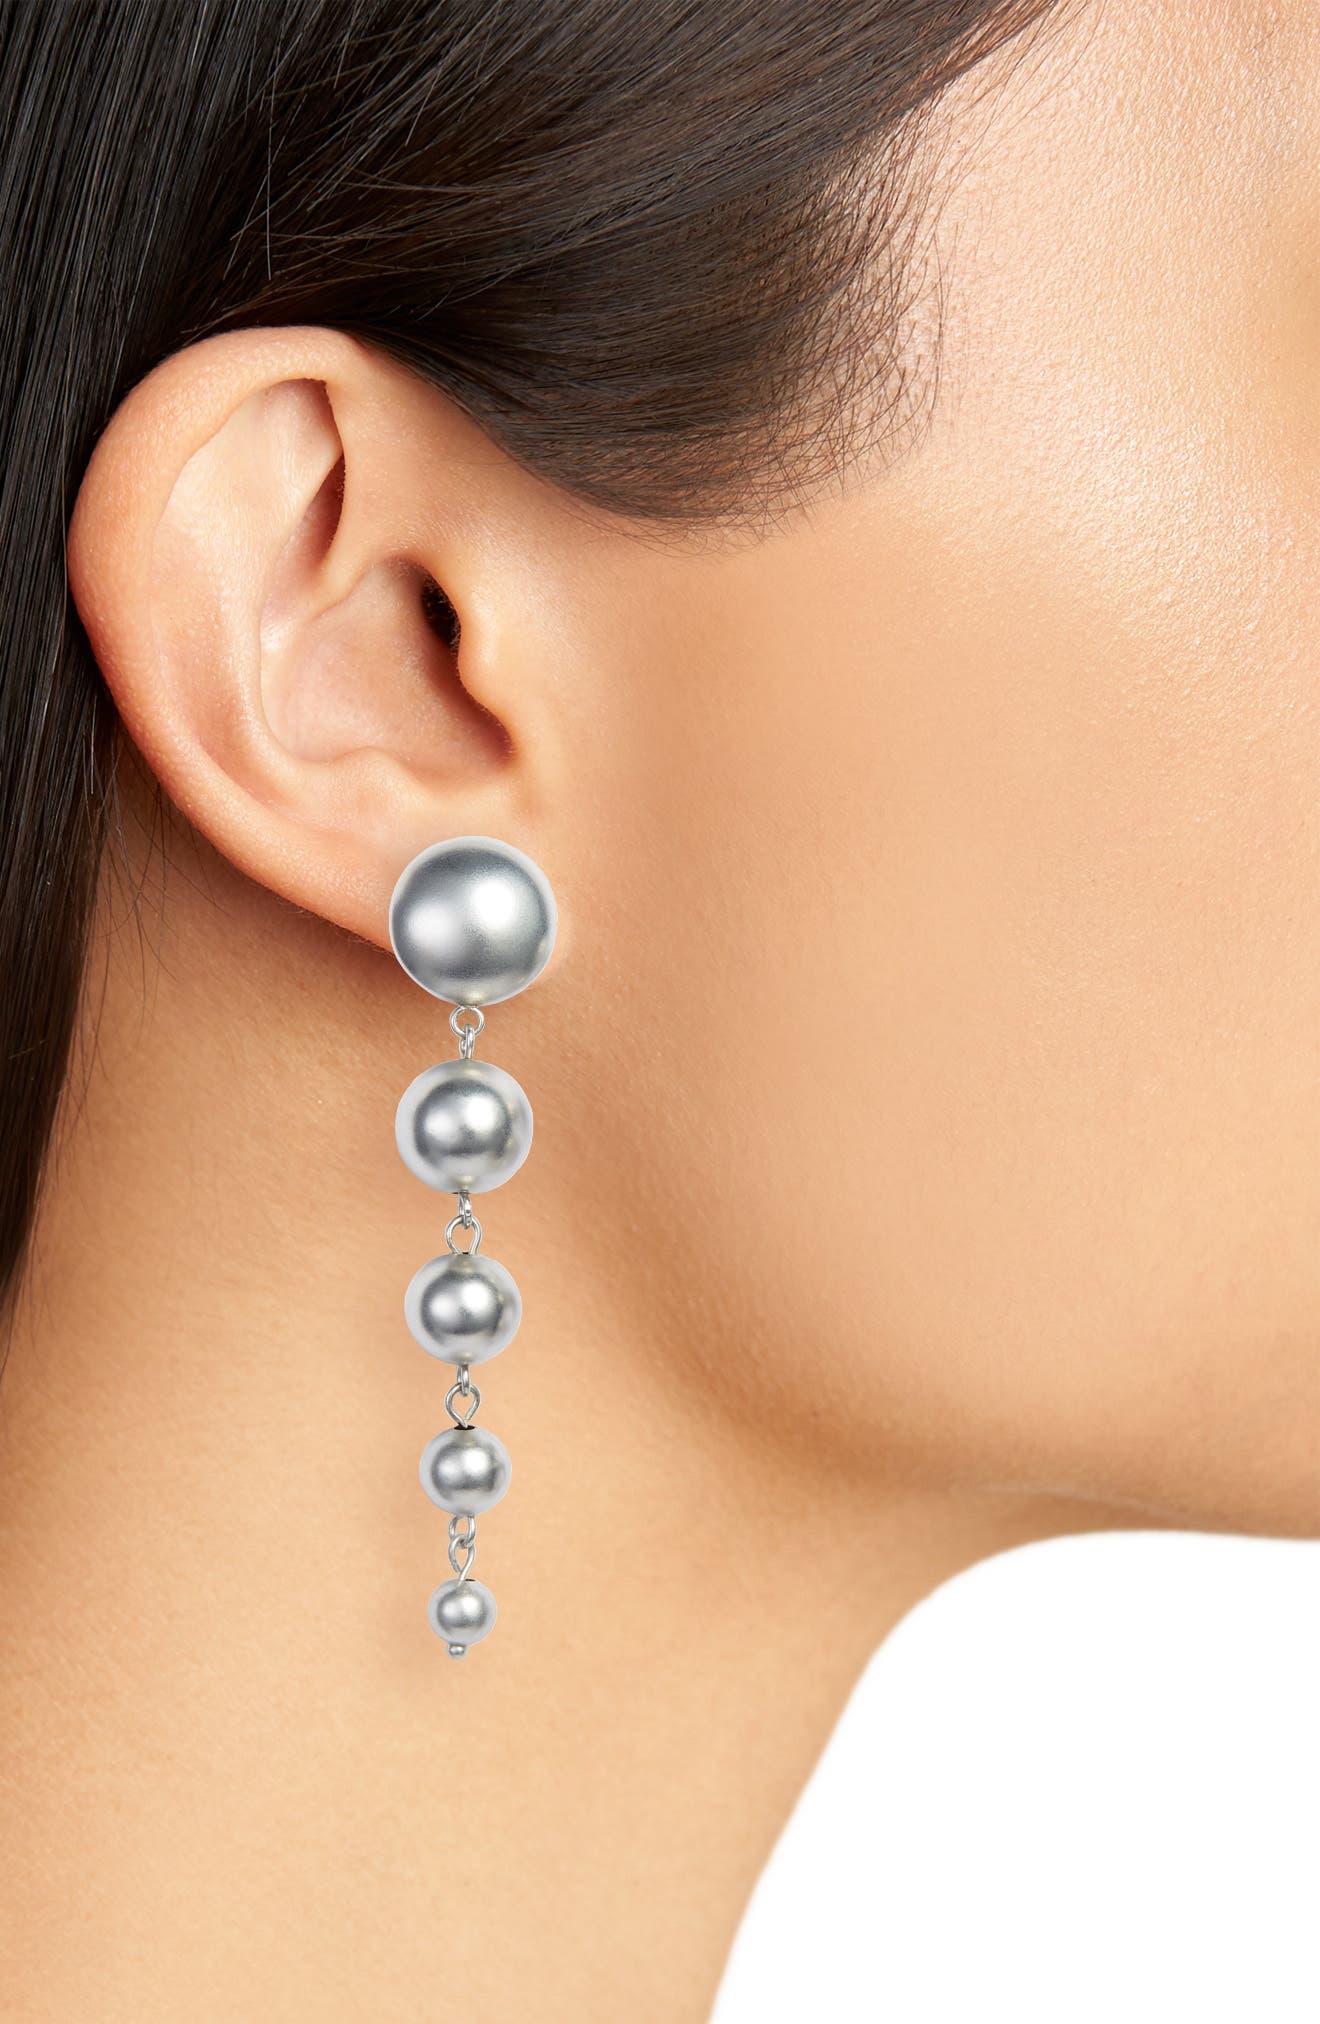 5-Sphere Graduated Drop Earrings,                             Alternate thumbnail 2, color,                             Rhodium